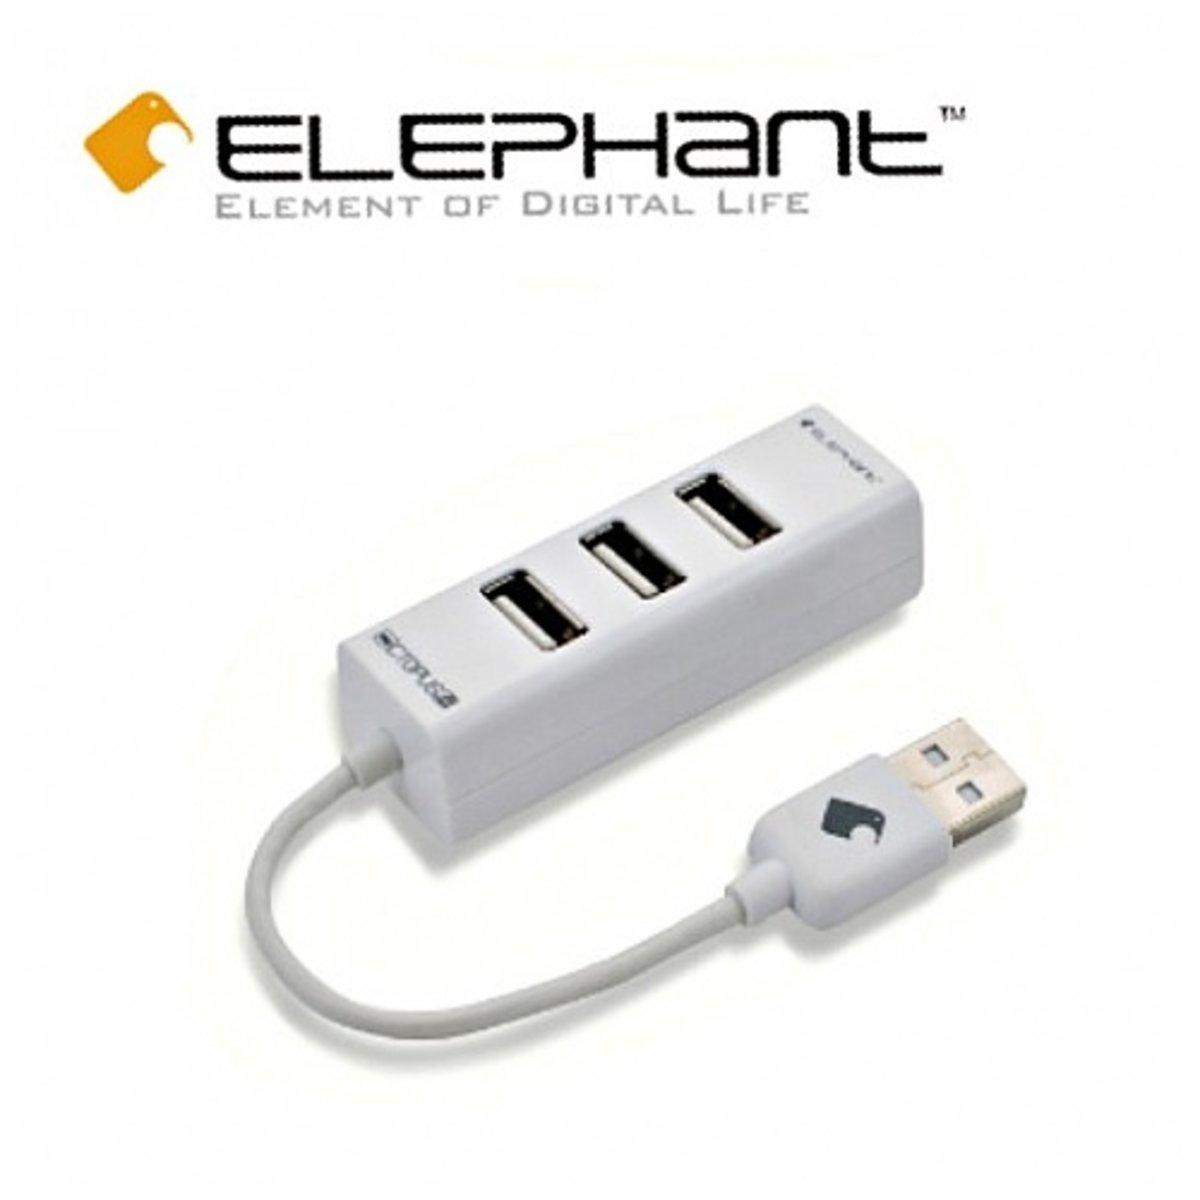 Octopus 4 Ports USB Hub (#WEH-1003) - White